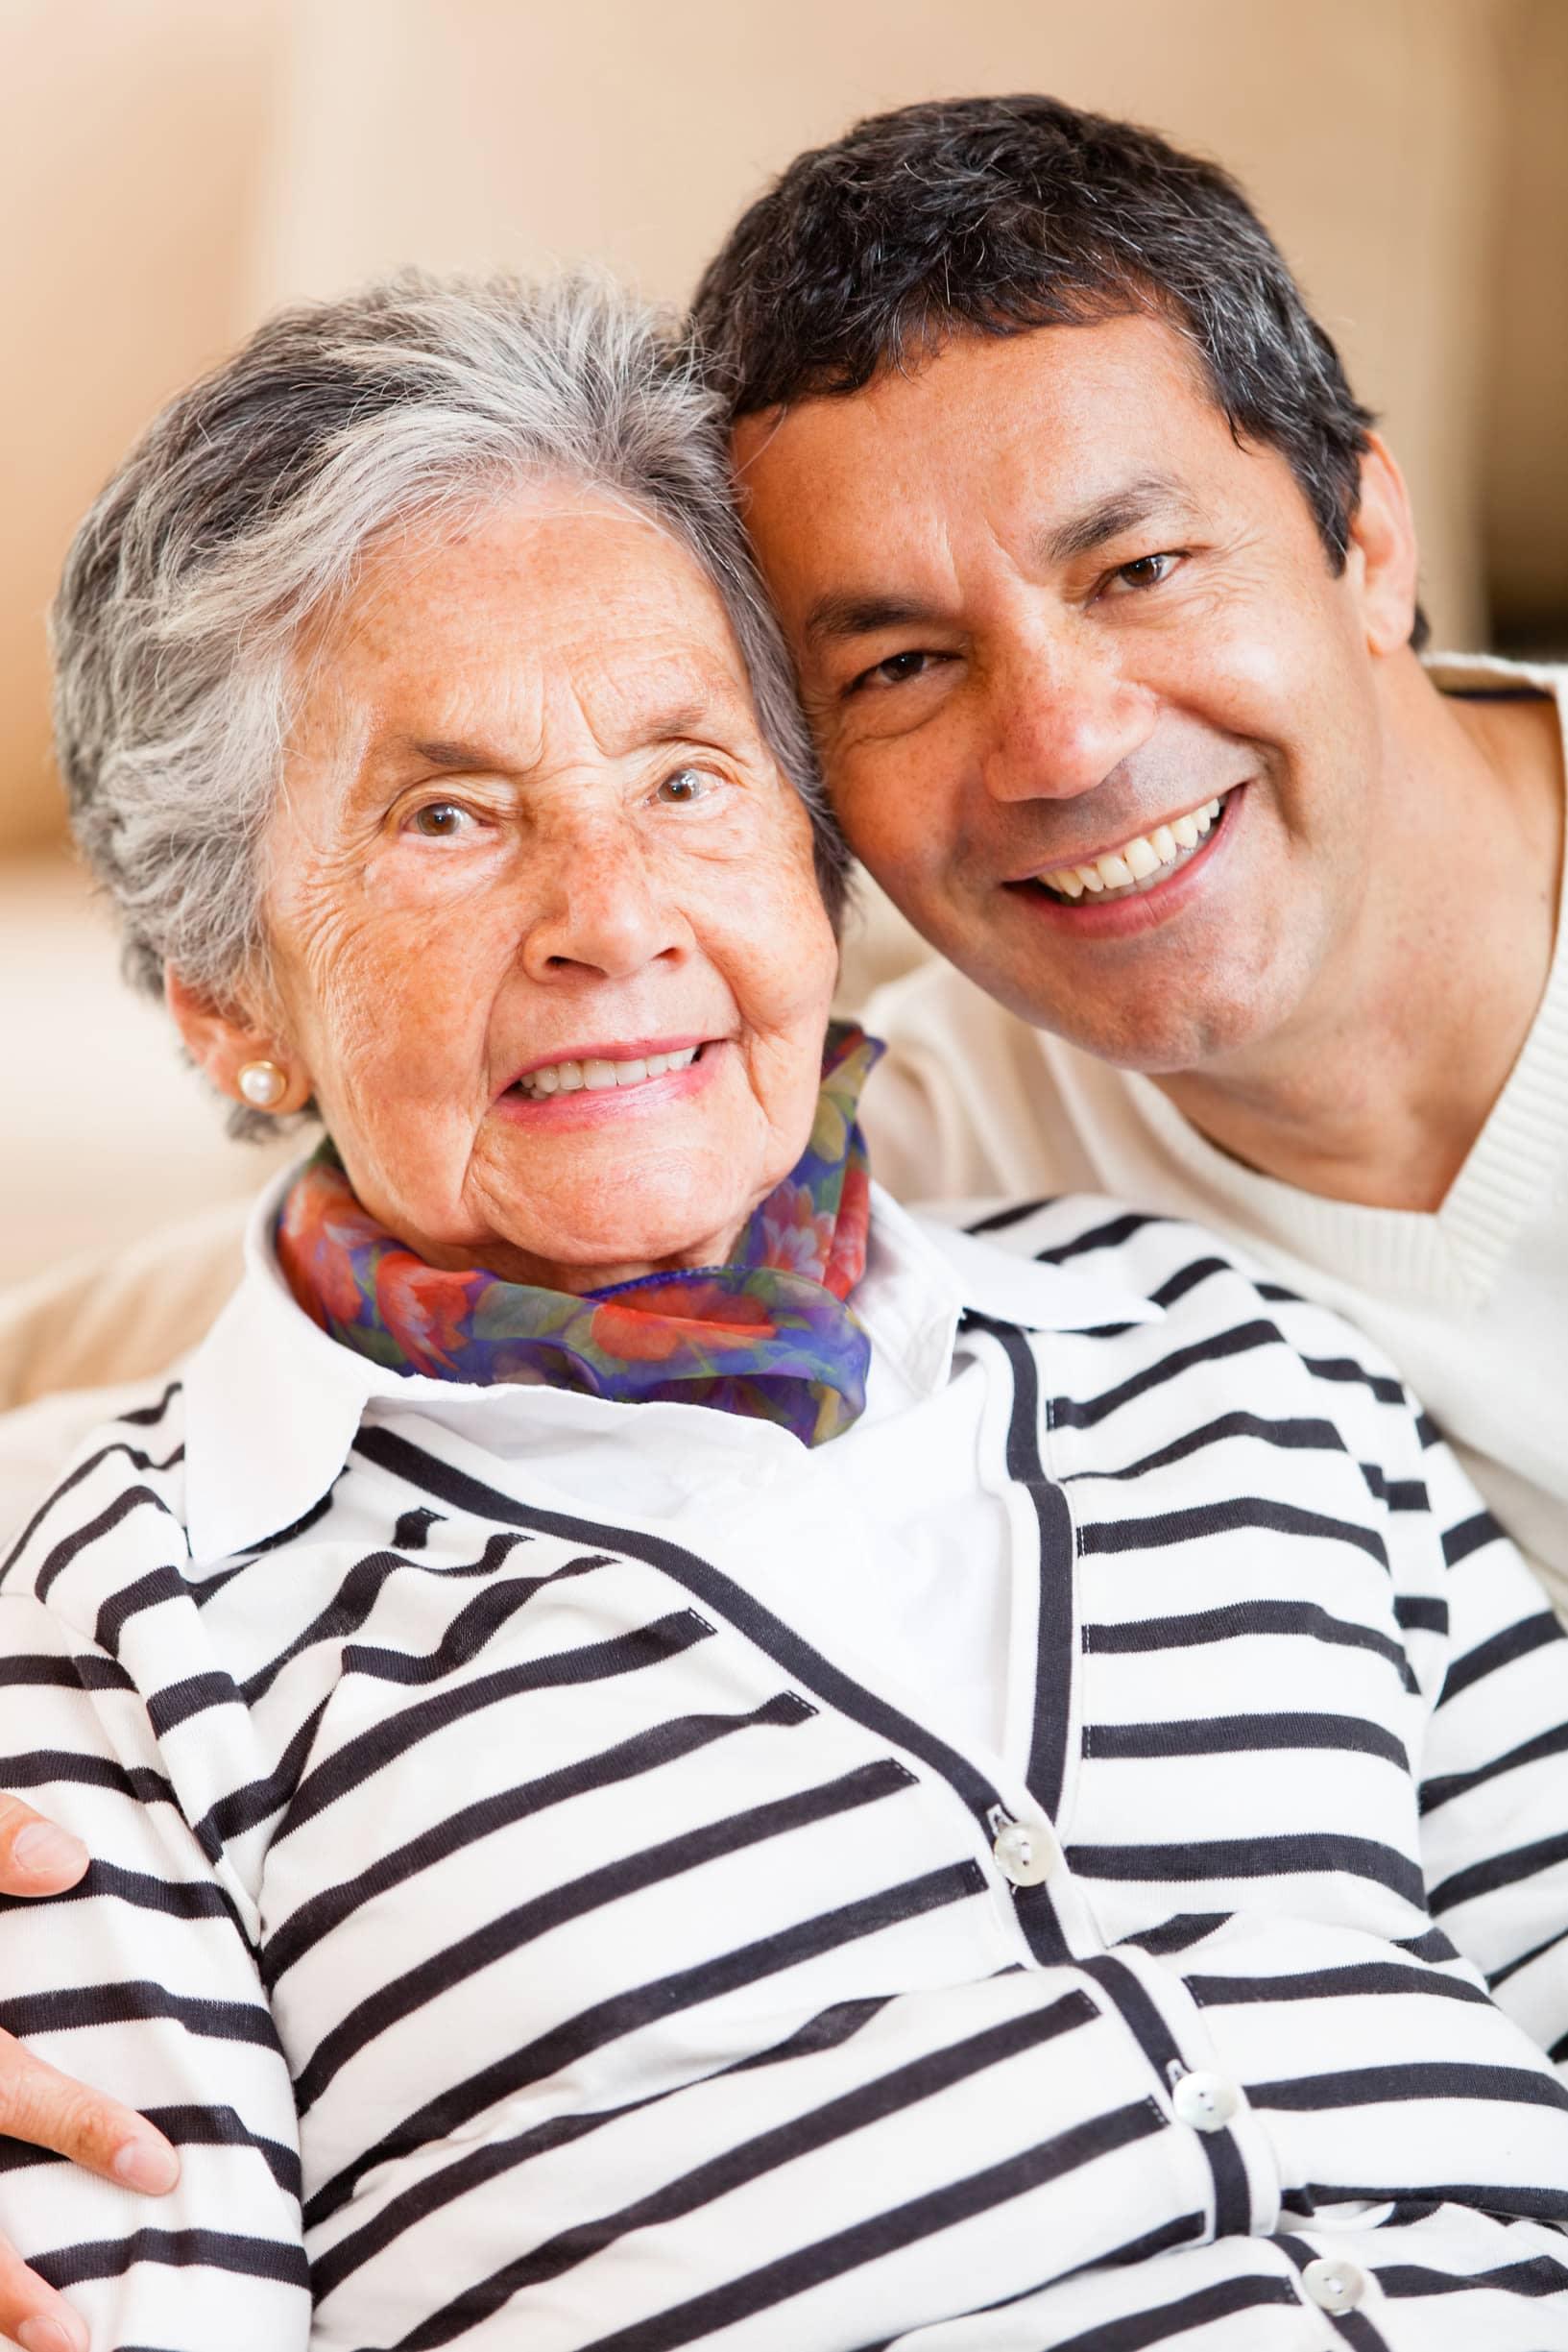 Senior living in Petaluma has lots of happy residents